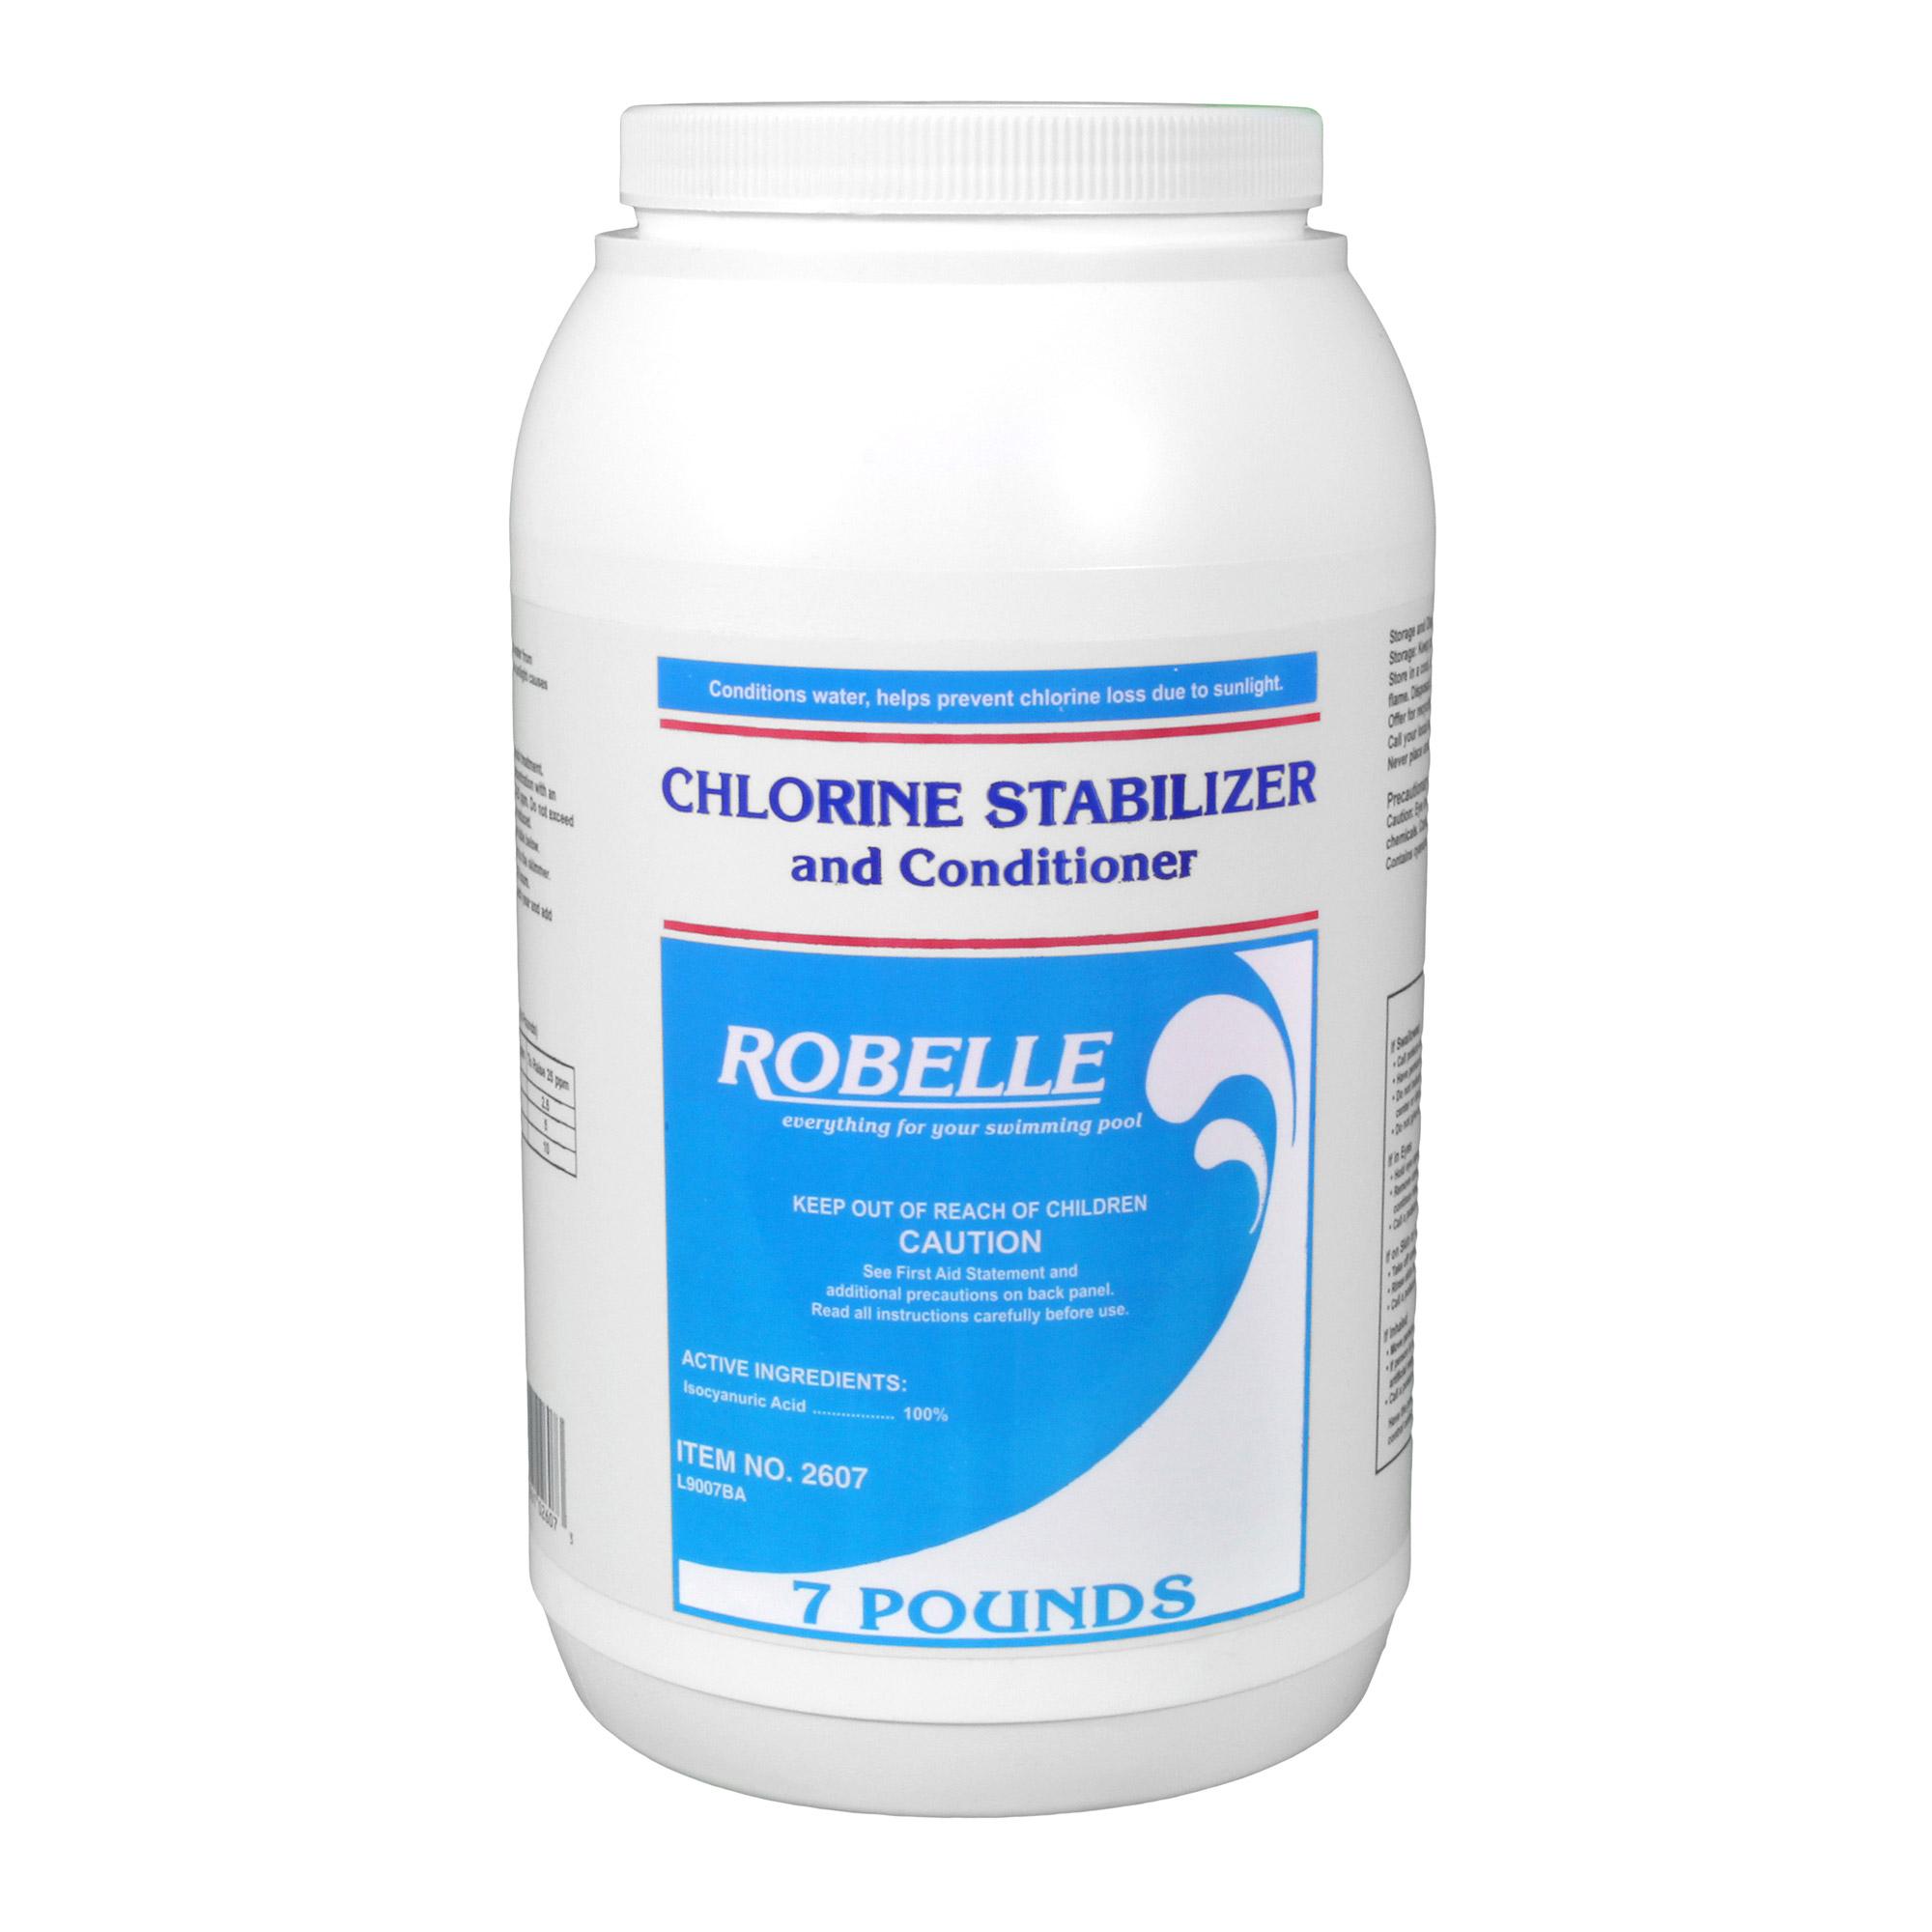 Robelle Chlorine Stabilizer Conditioner 4 Lbs Pool Stabilizer Conditioner Splash Super